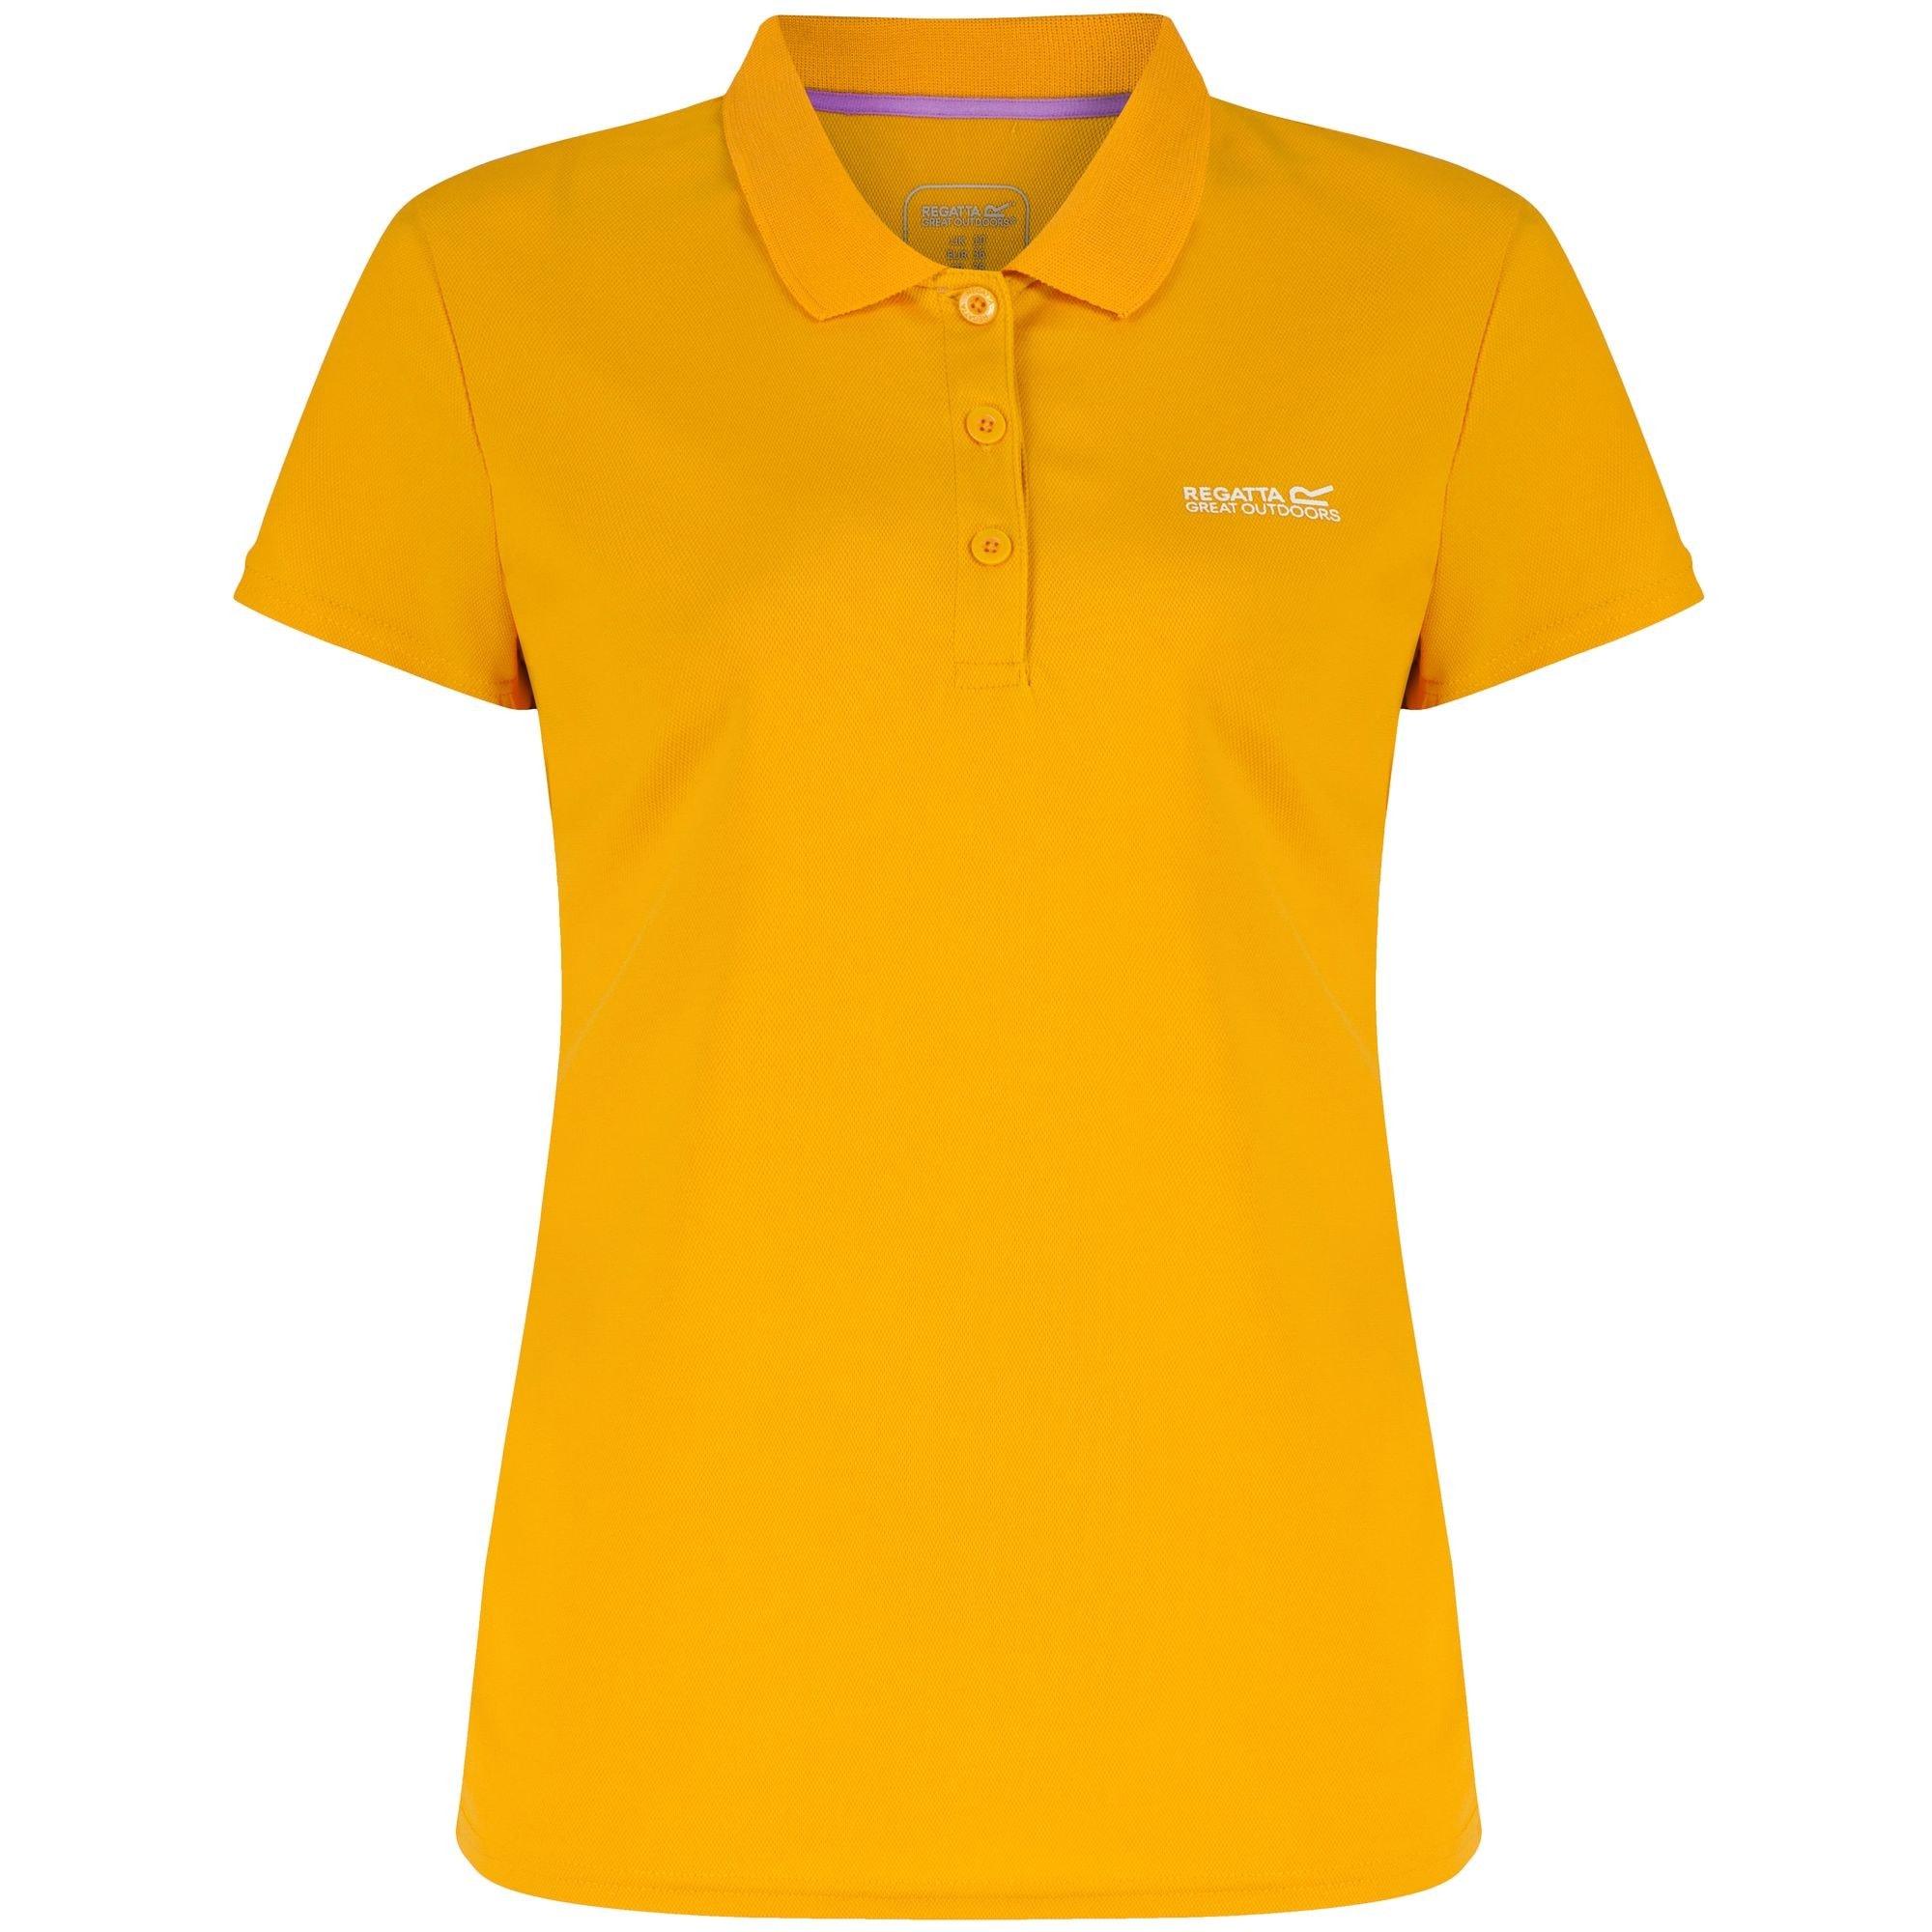 Regatta Poloshirt Great Outdoors Damen Maverik III Kurzarm Polo Shirt